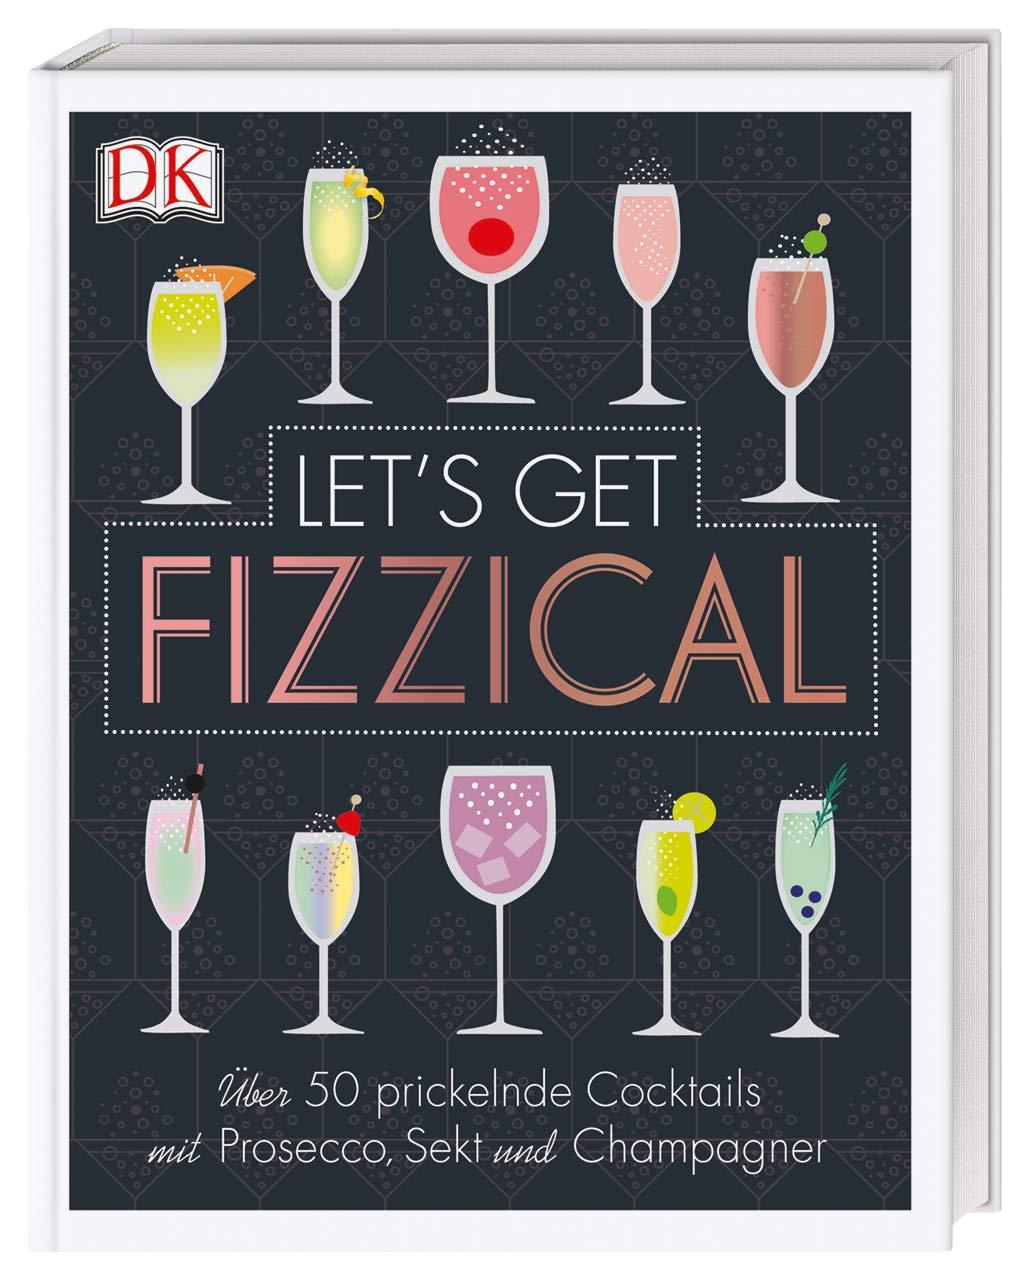 Let's Get Fizzical  Über 50 Prickelnde Cocktails Mit Prosecco Sekt Und Champagner